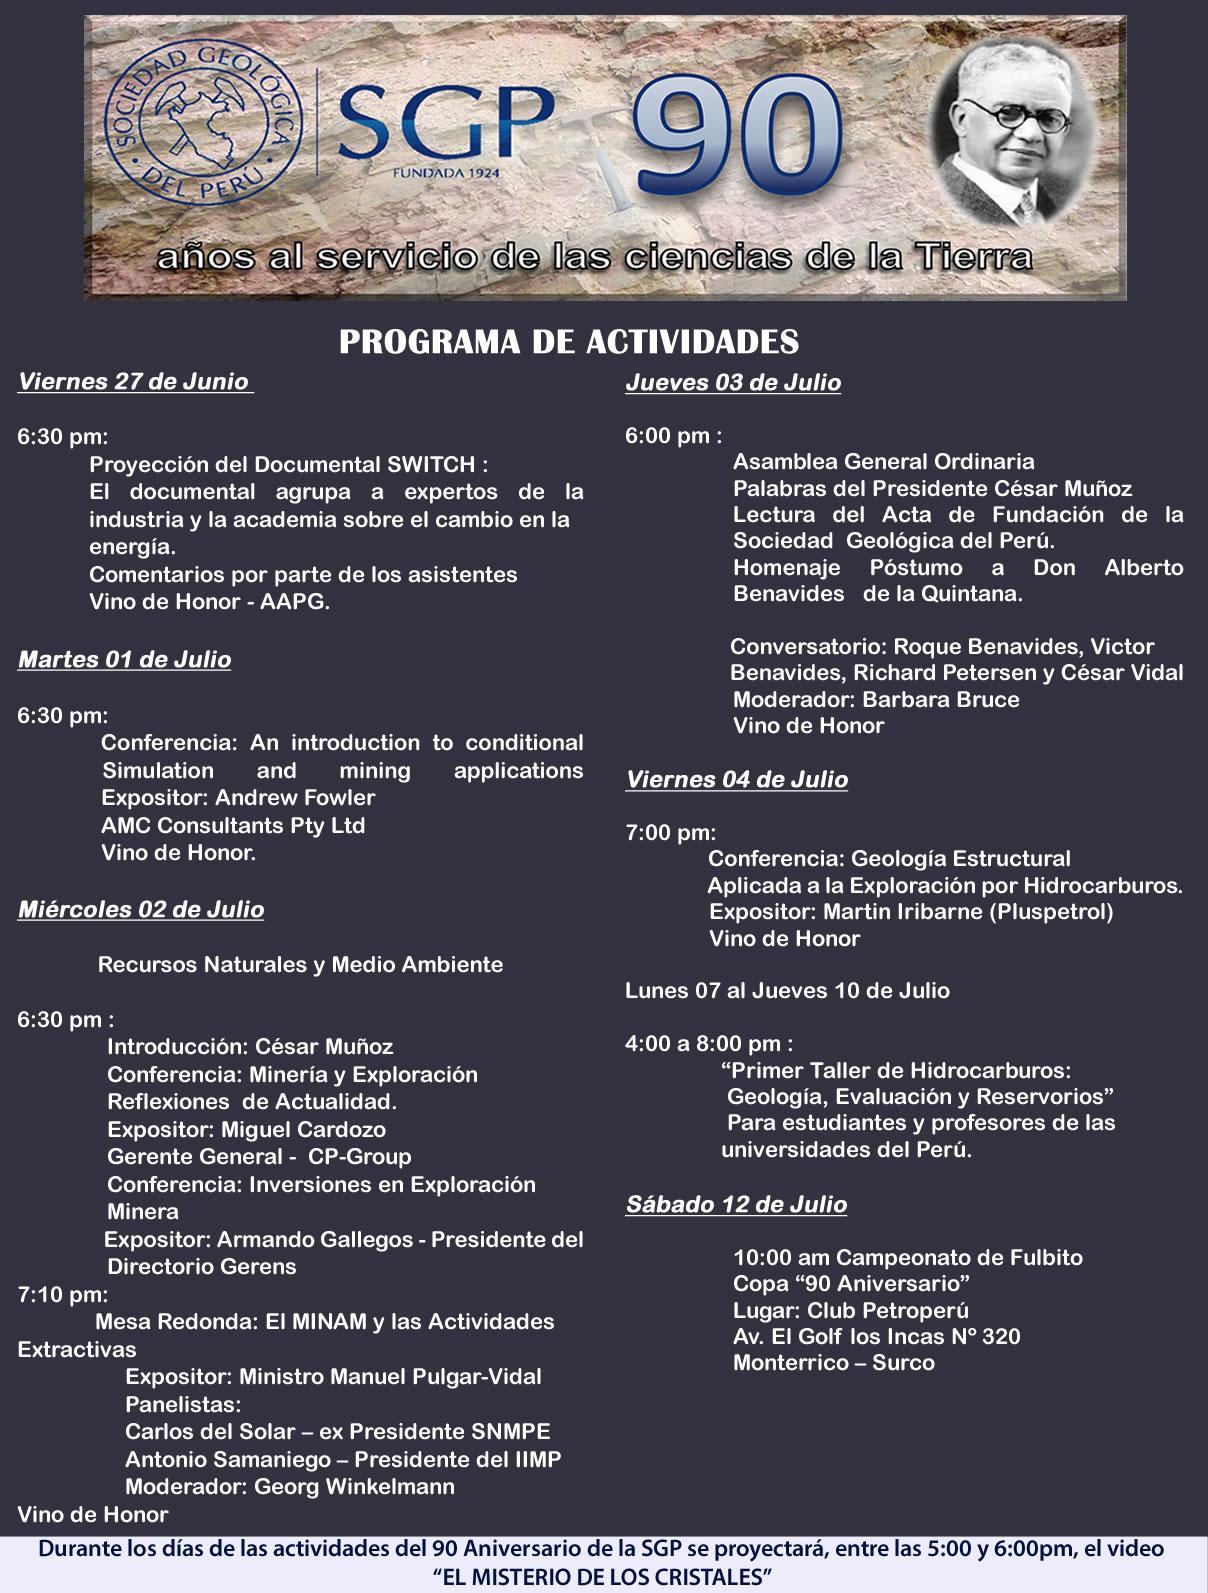 PROGRAMA DE ACTIVIDADES de SEMANA DE ANIVERSARIO